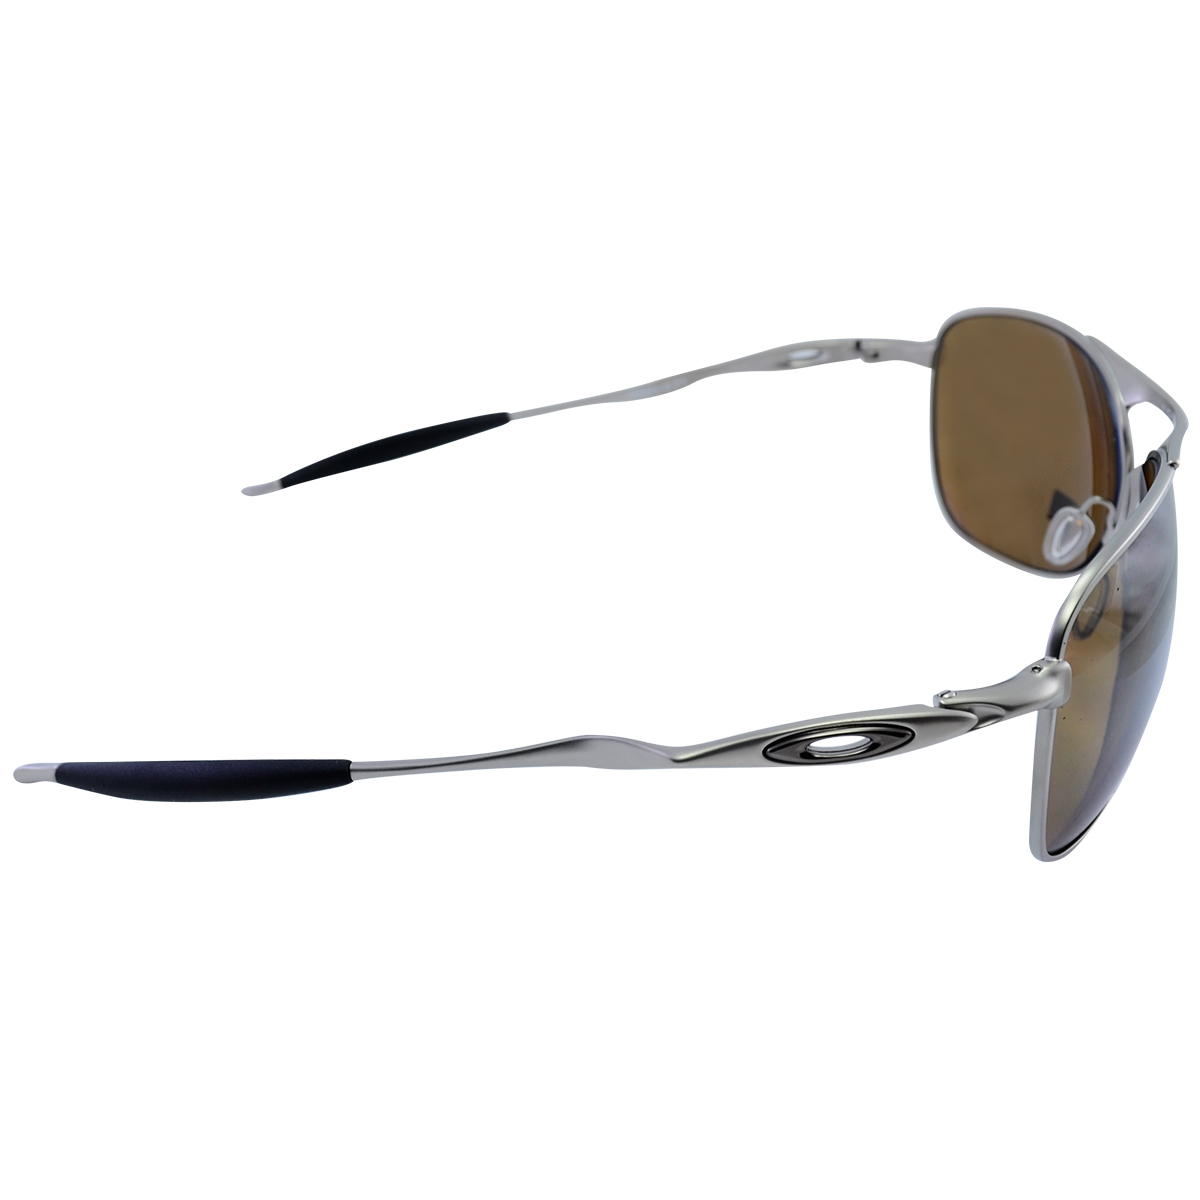 ... Óculos Oakley Crosshair Brown Titanium Lente Tungstein Iridium  Polarizado ... c1d769816d